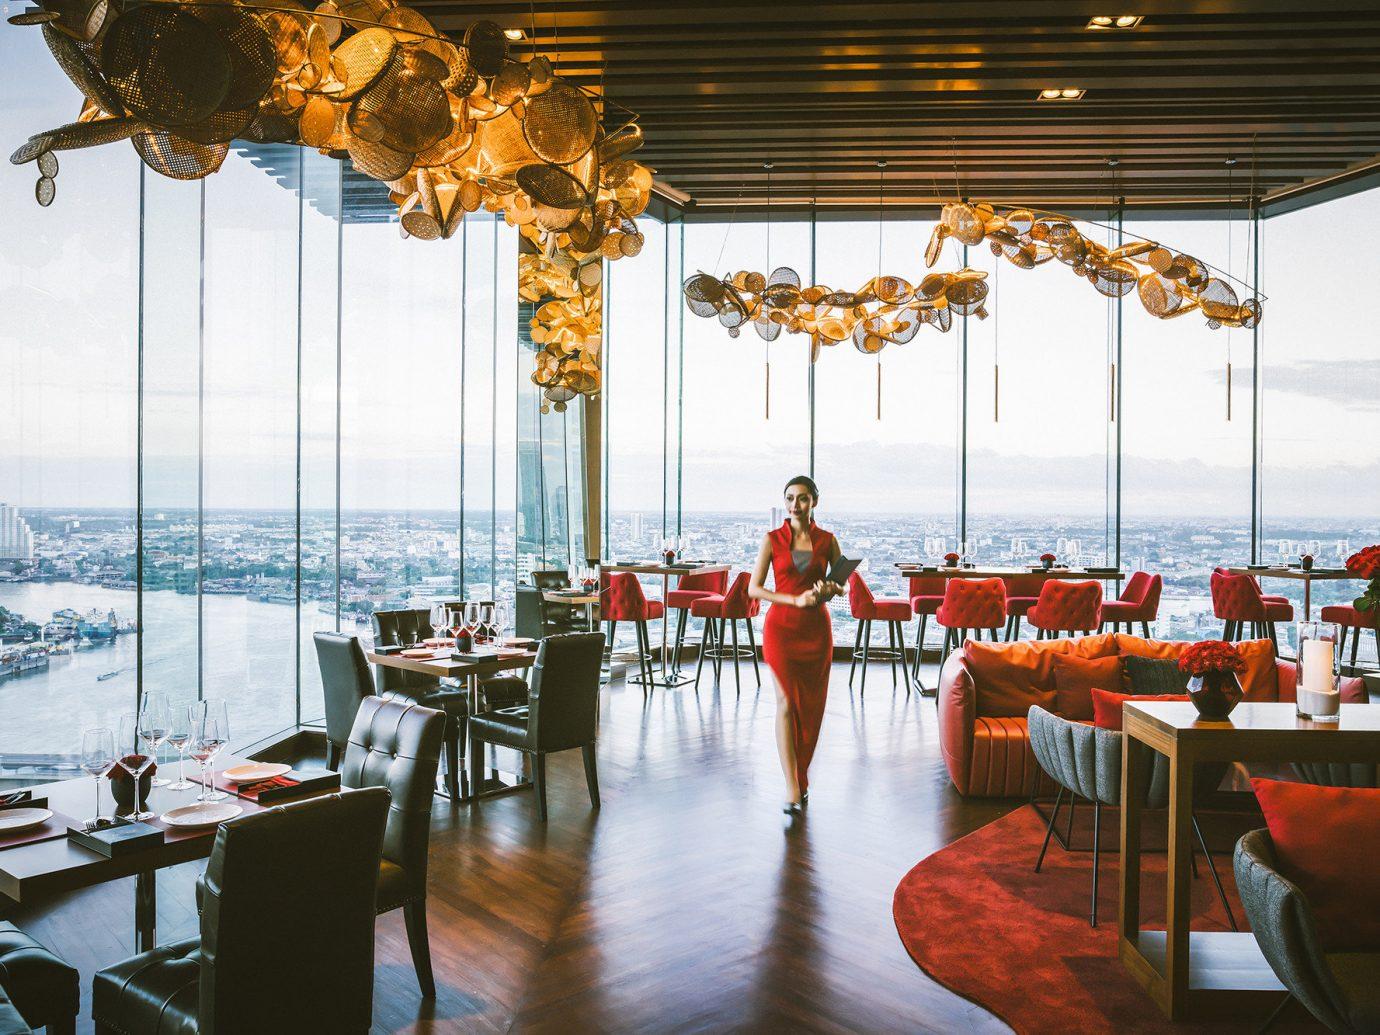 Hotels floor indoor restaurant meal Resort function hall interior design estate palace several